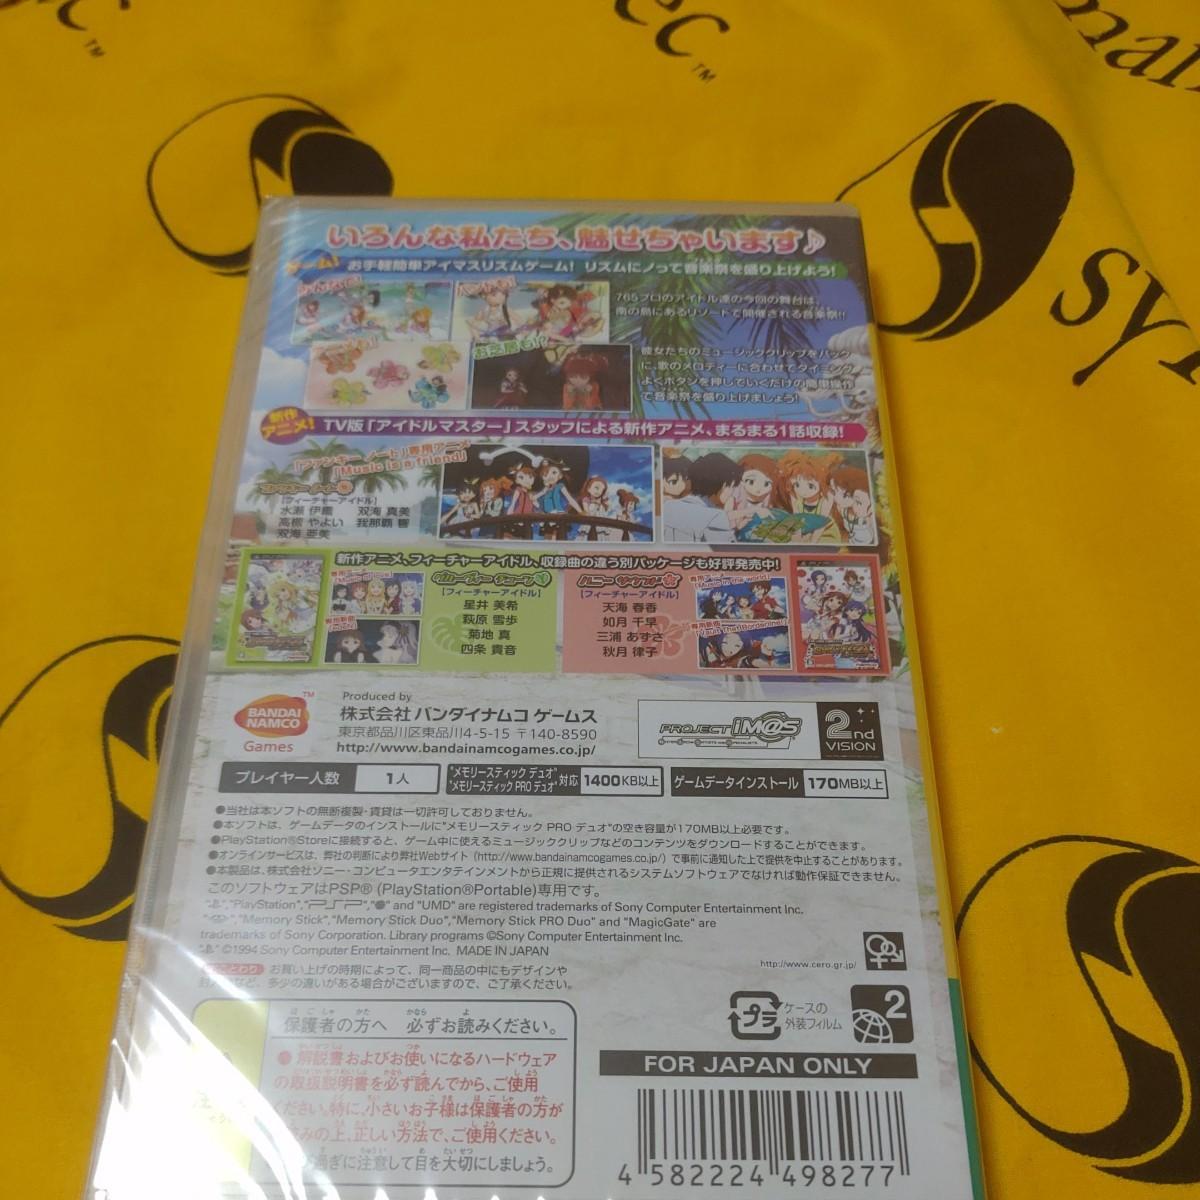 【PSP】 アイドルマスター シャイニーフェスタ ファンキーノート